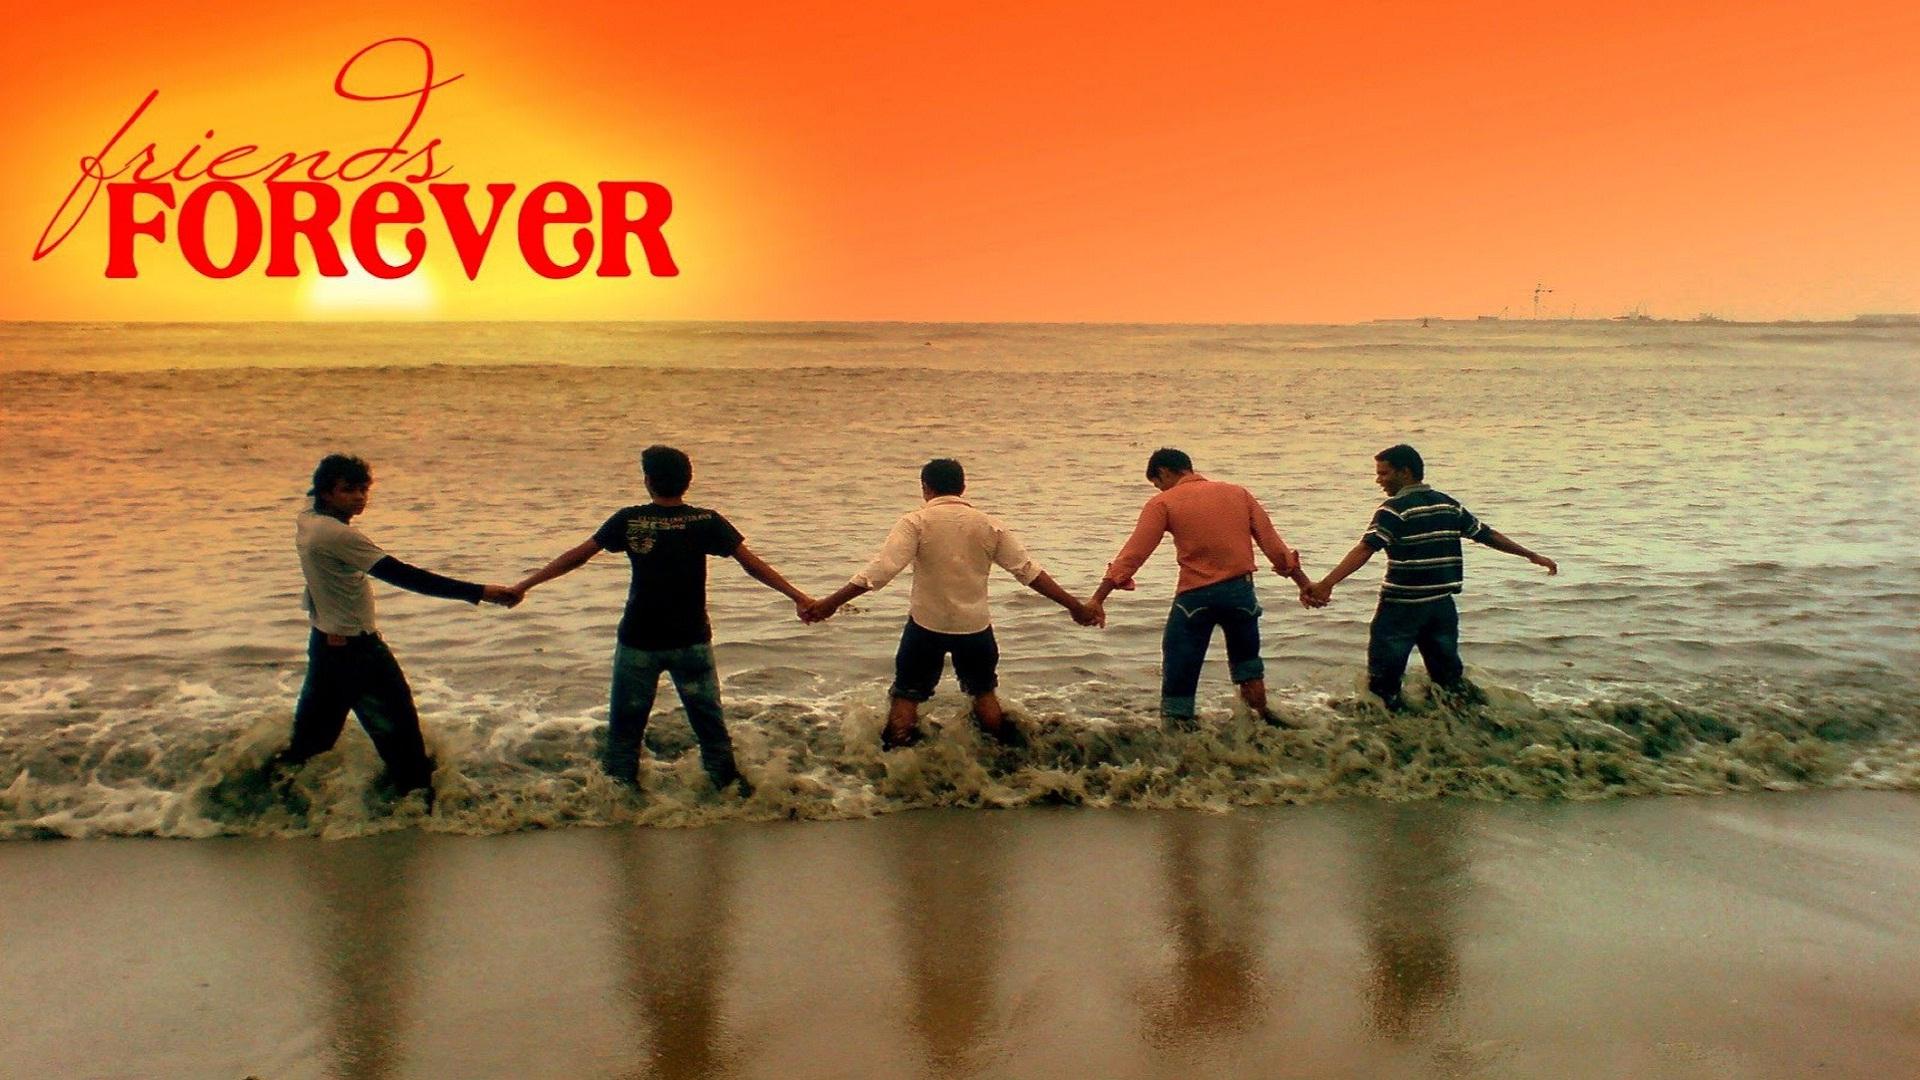 friends forever wallpaper 1920x1080